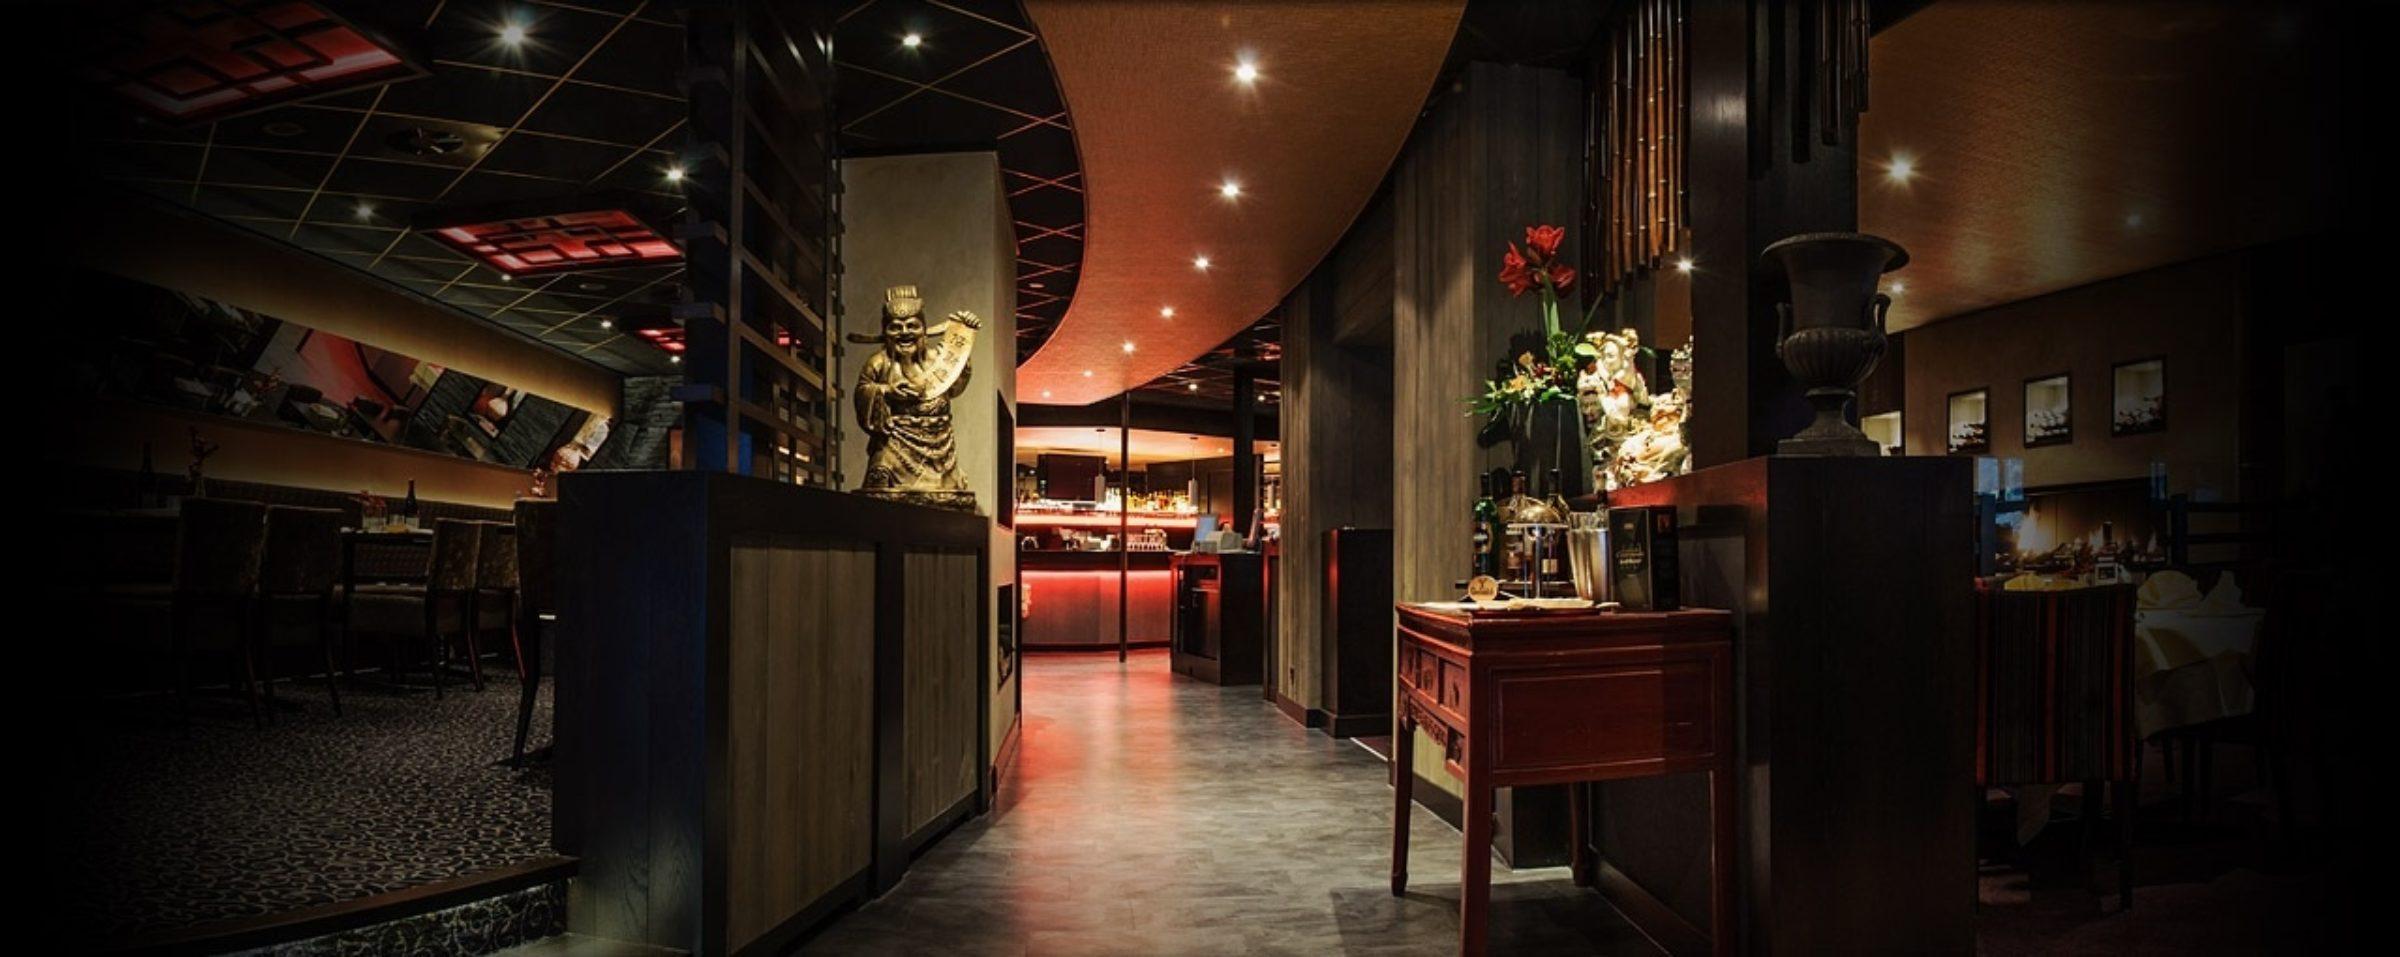 Restaurant Enschede Hus Garden Chinees